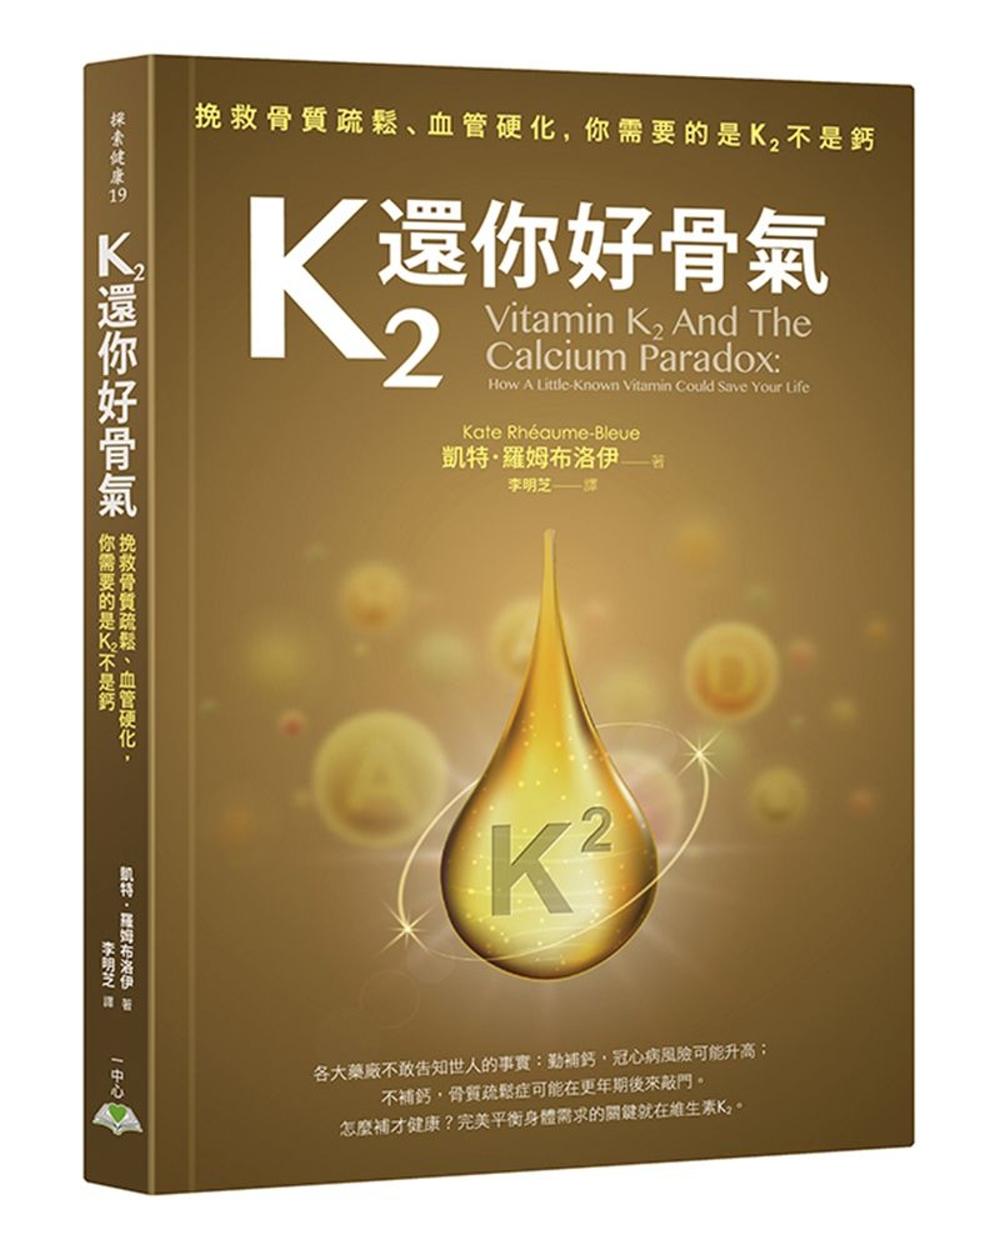 K2還你好骨氣:挽救骨質疏鬆、血管硬化,你需要的是K2不是鈣